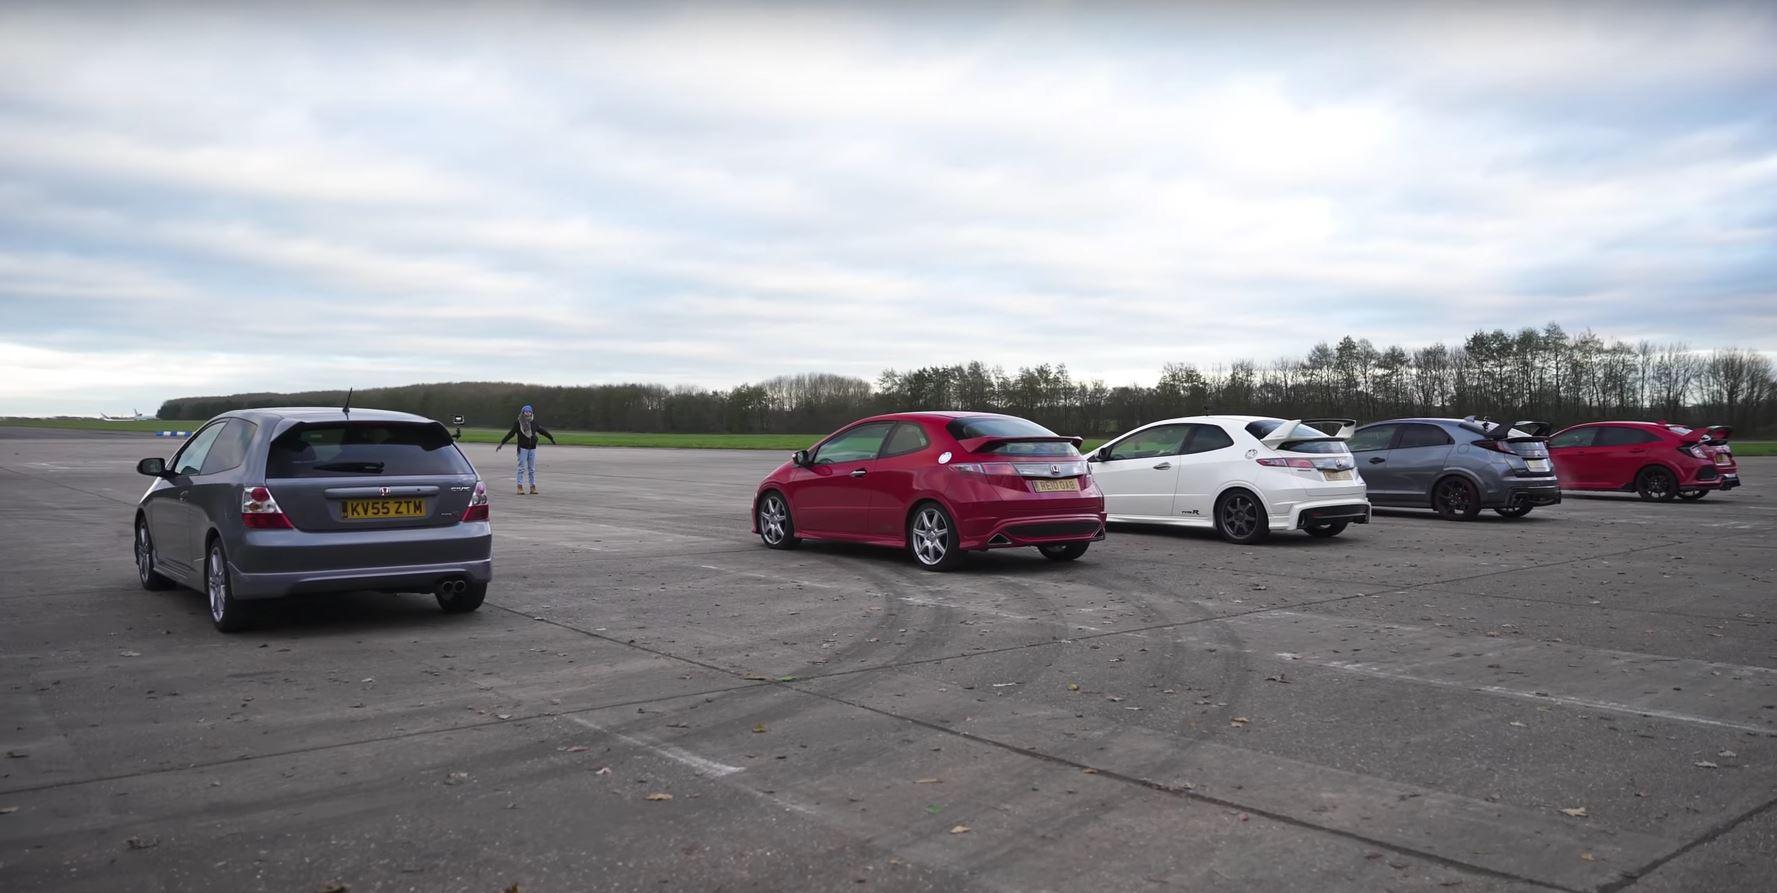 Honda Civic Type R Drag Race Features Ep Fn Fn Mugen Fk And Fk on 1997 Honda Civic Hatchback Engine